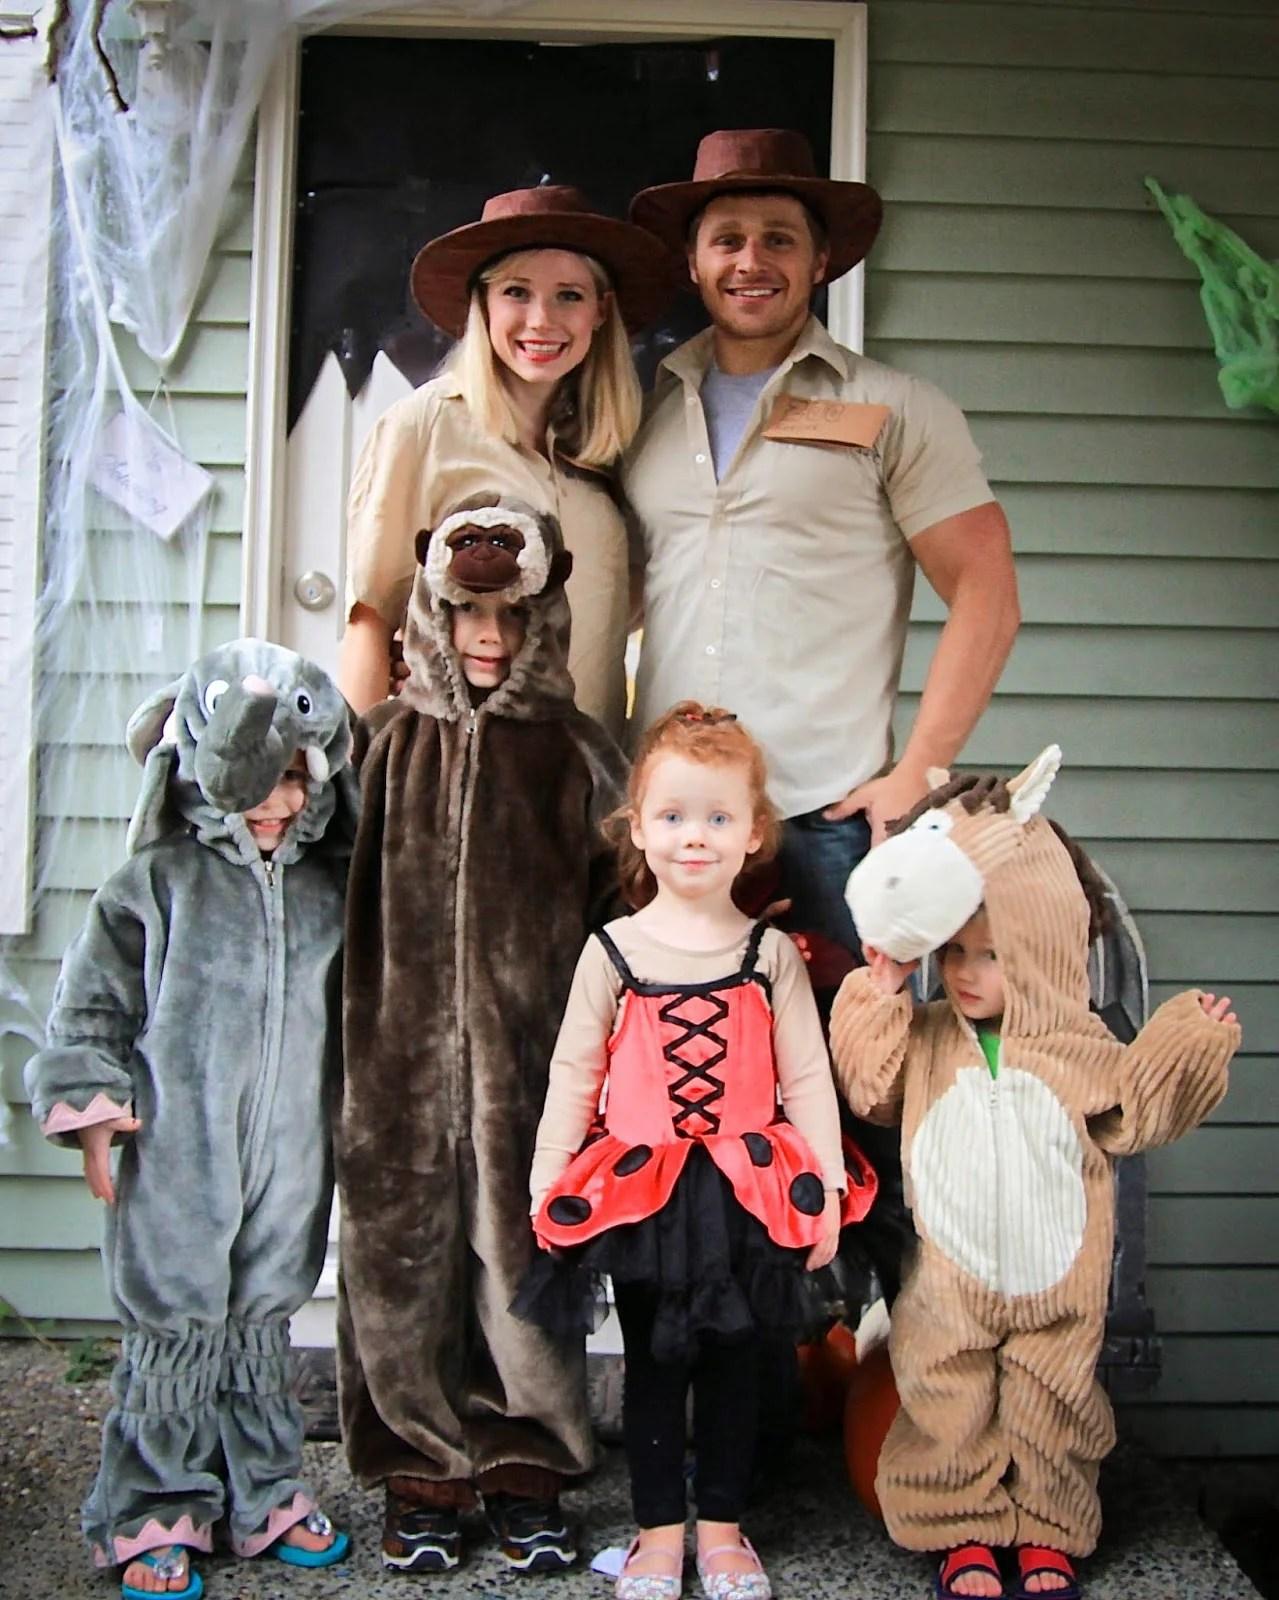 Alice In Wonderland Halloween Costume Family.Remodelaholic 25 Creative Family Halloween Costume Ideas